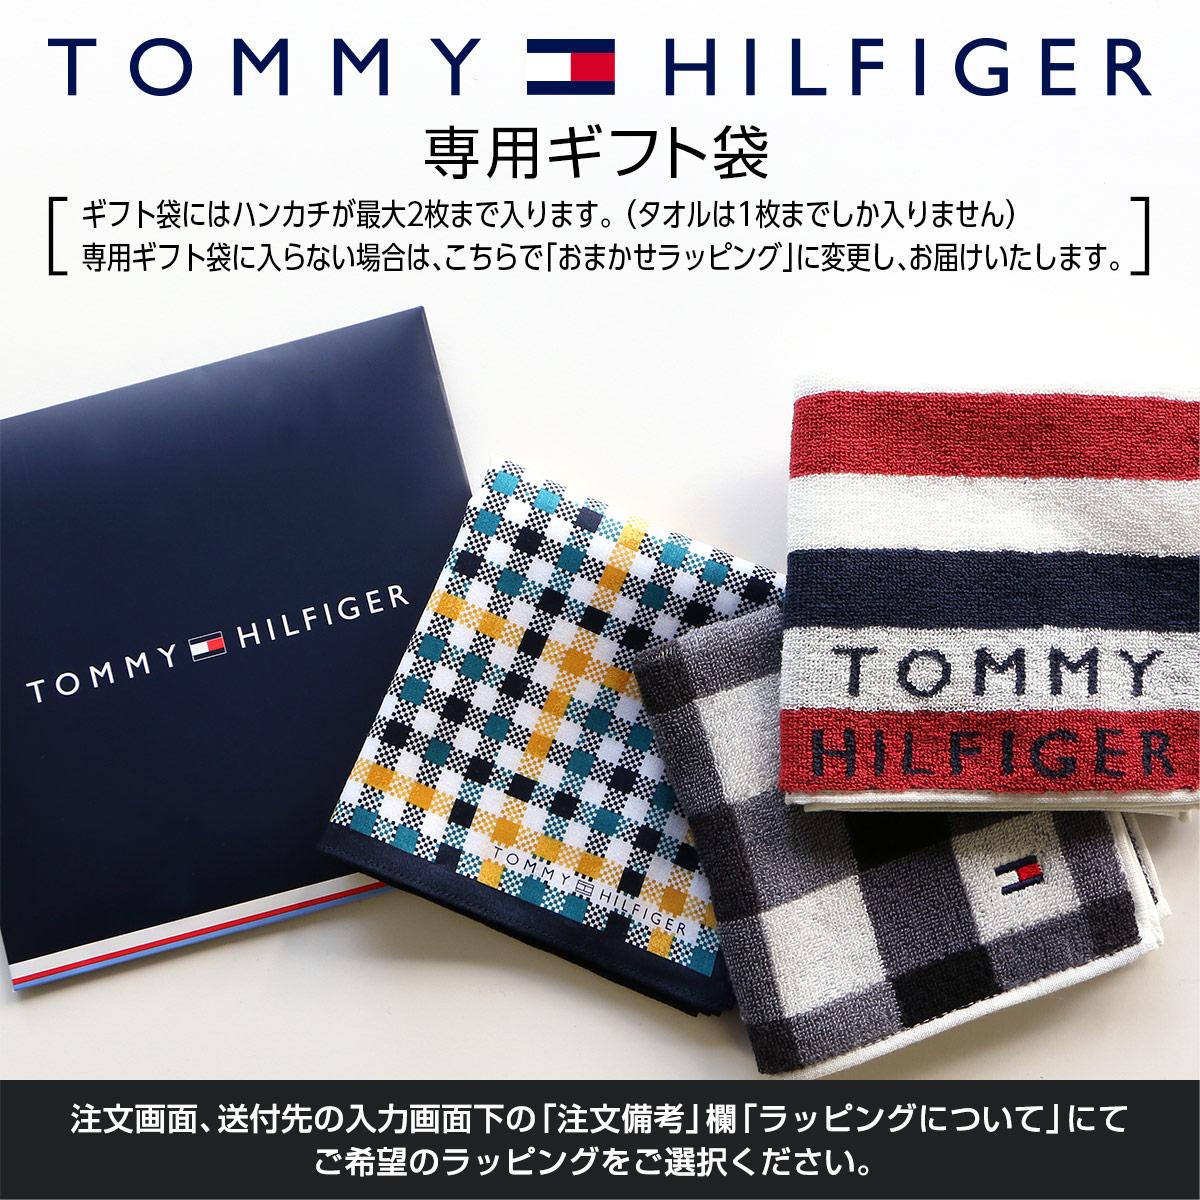 TOMMY HILFIGERタオル・ハンカチギフトラッピング